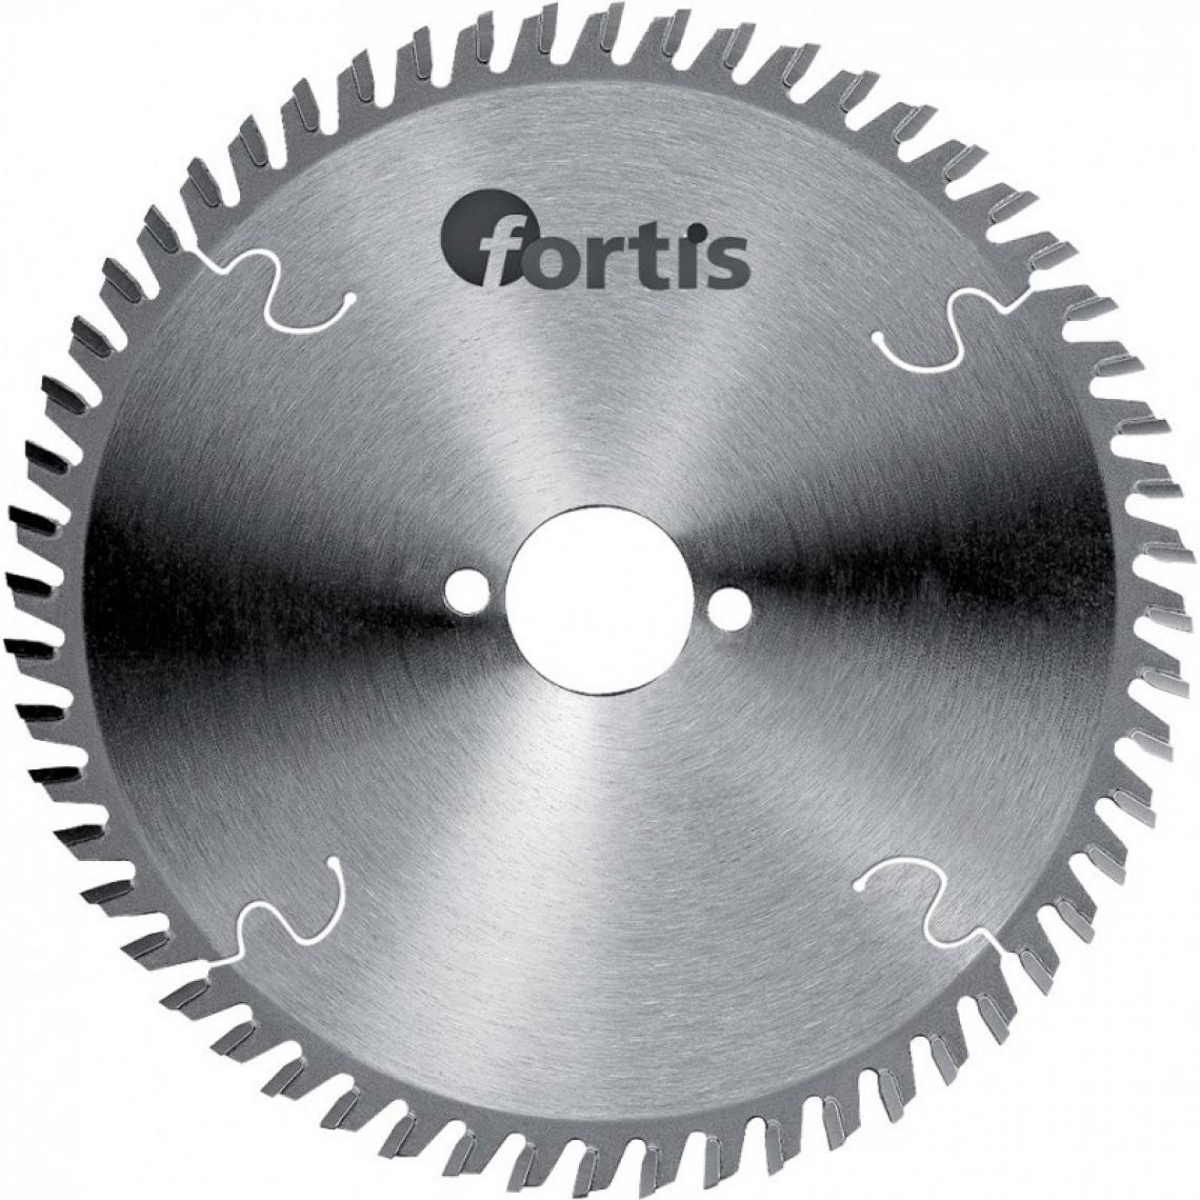 Fortis HW-Lame scie 210x3,0 x30mm Z48W Fortis